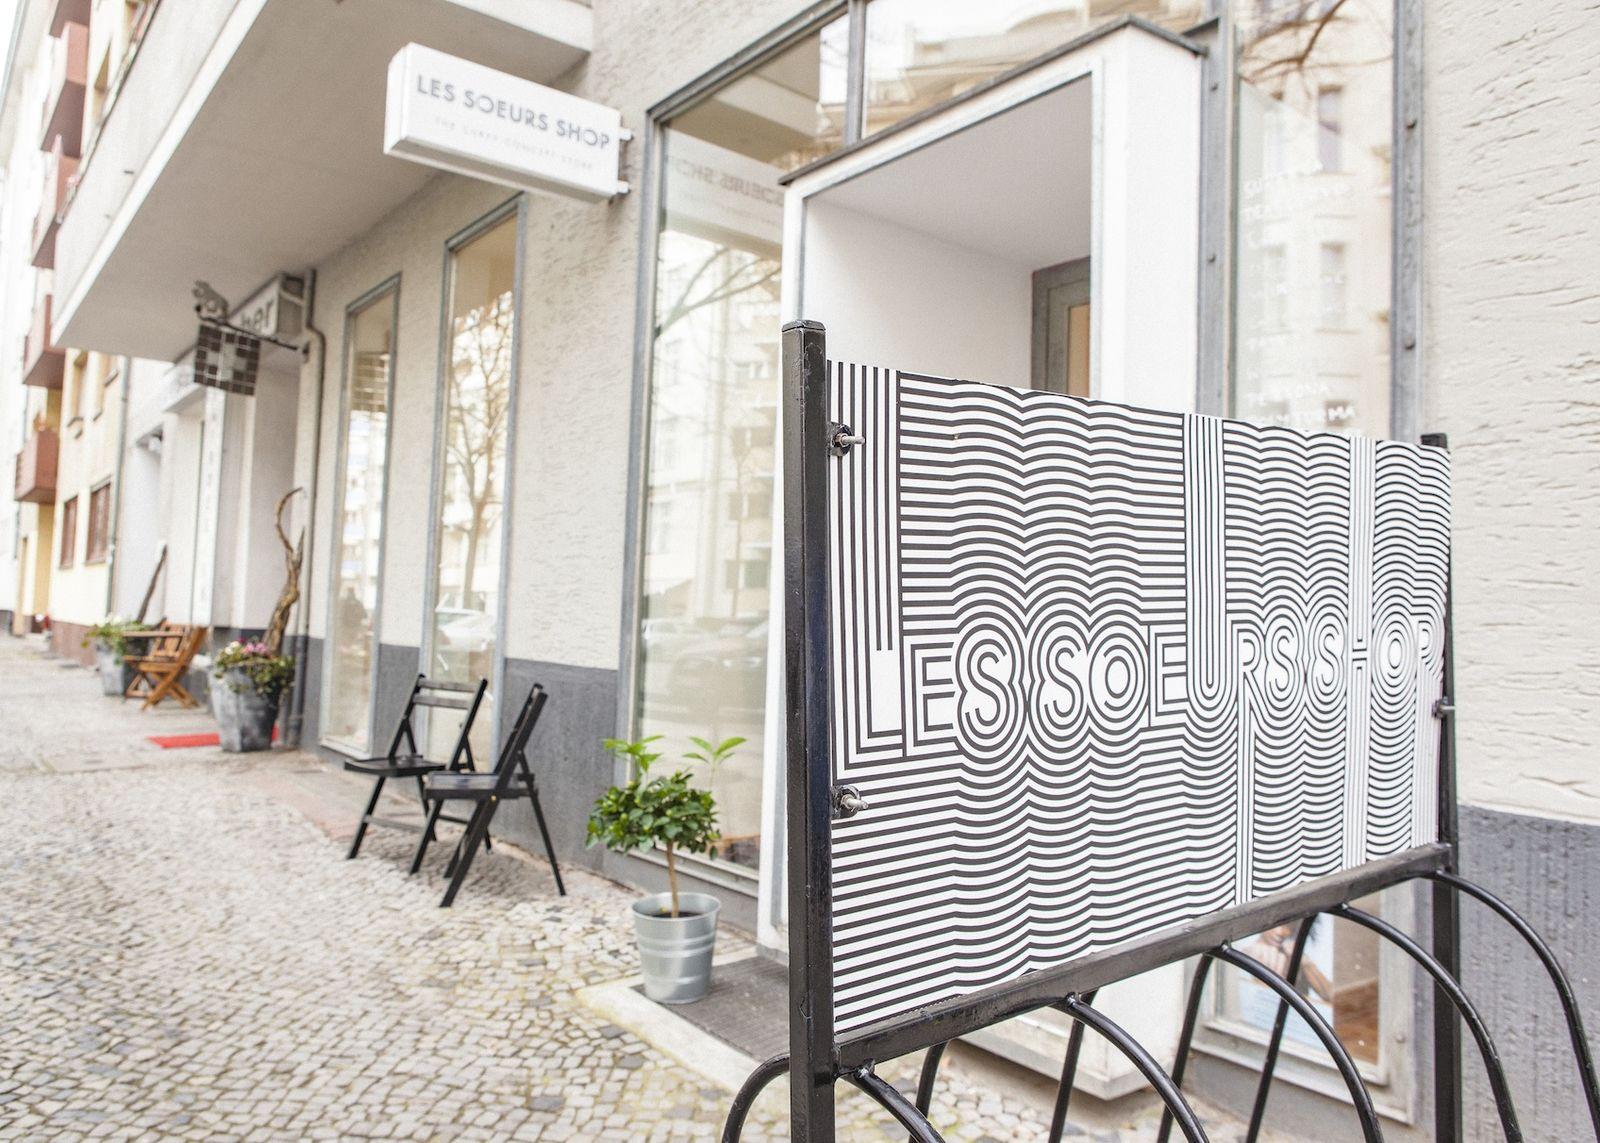 Les Soeurs Shop - The Curvy Concept Store in Berlin (Bild 8)